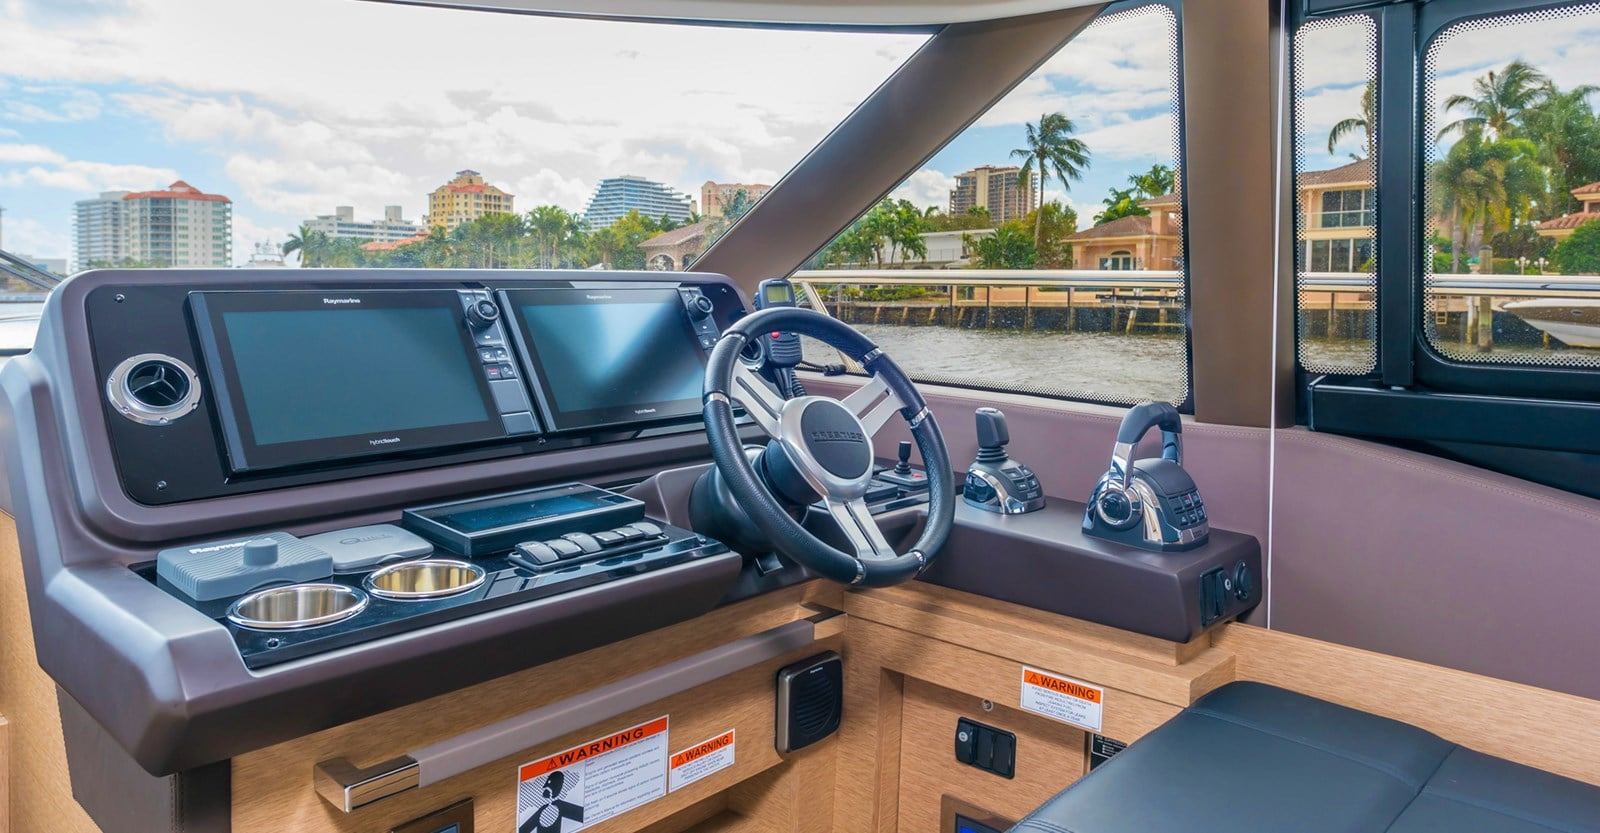 prestige 460 yacht lower helmjpg